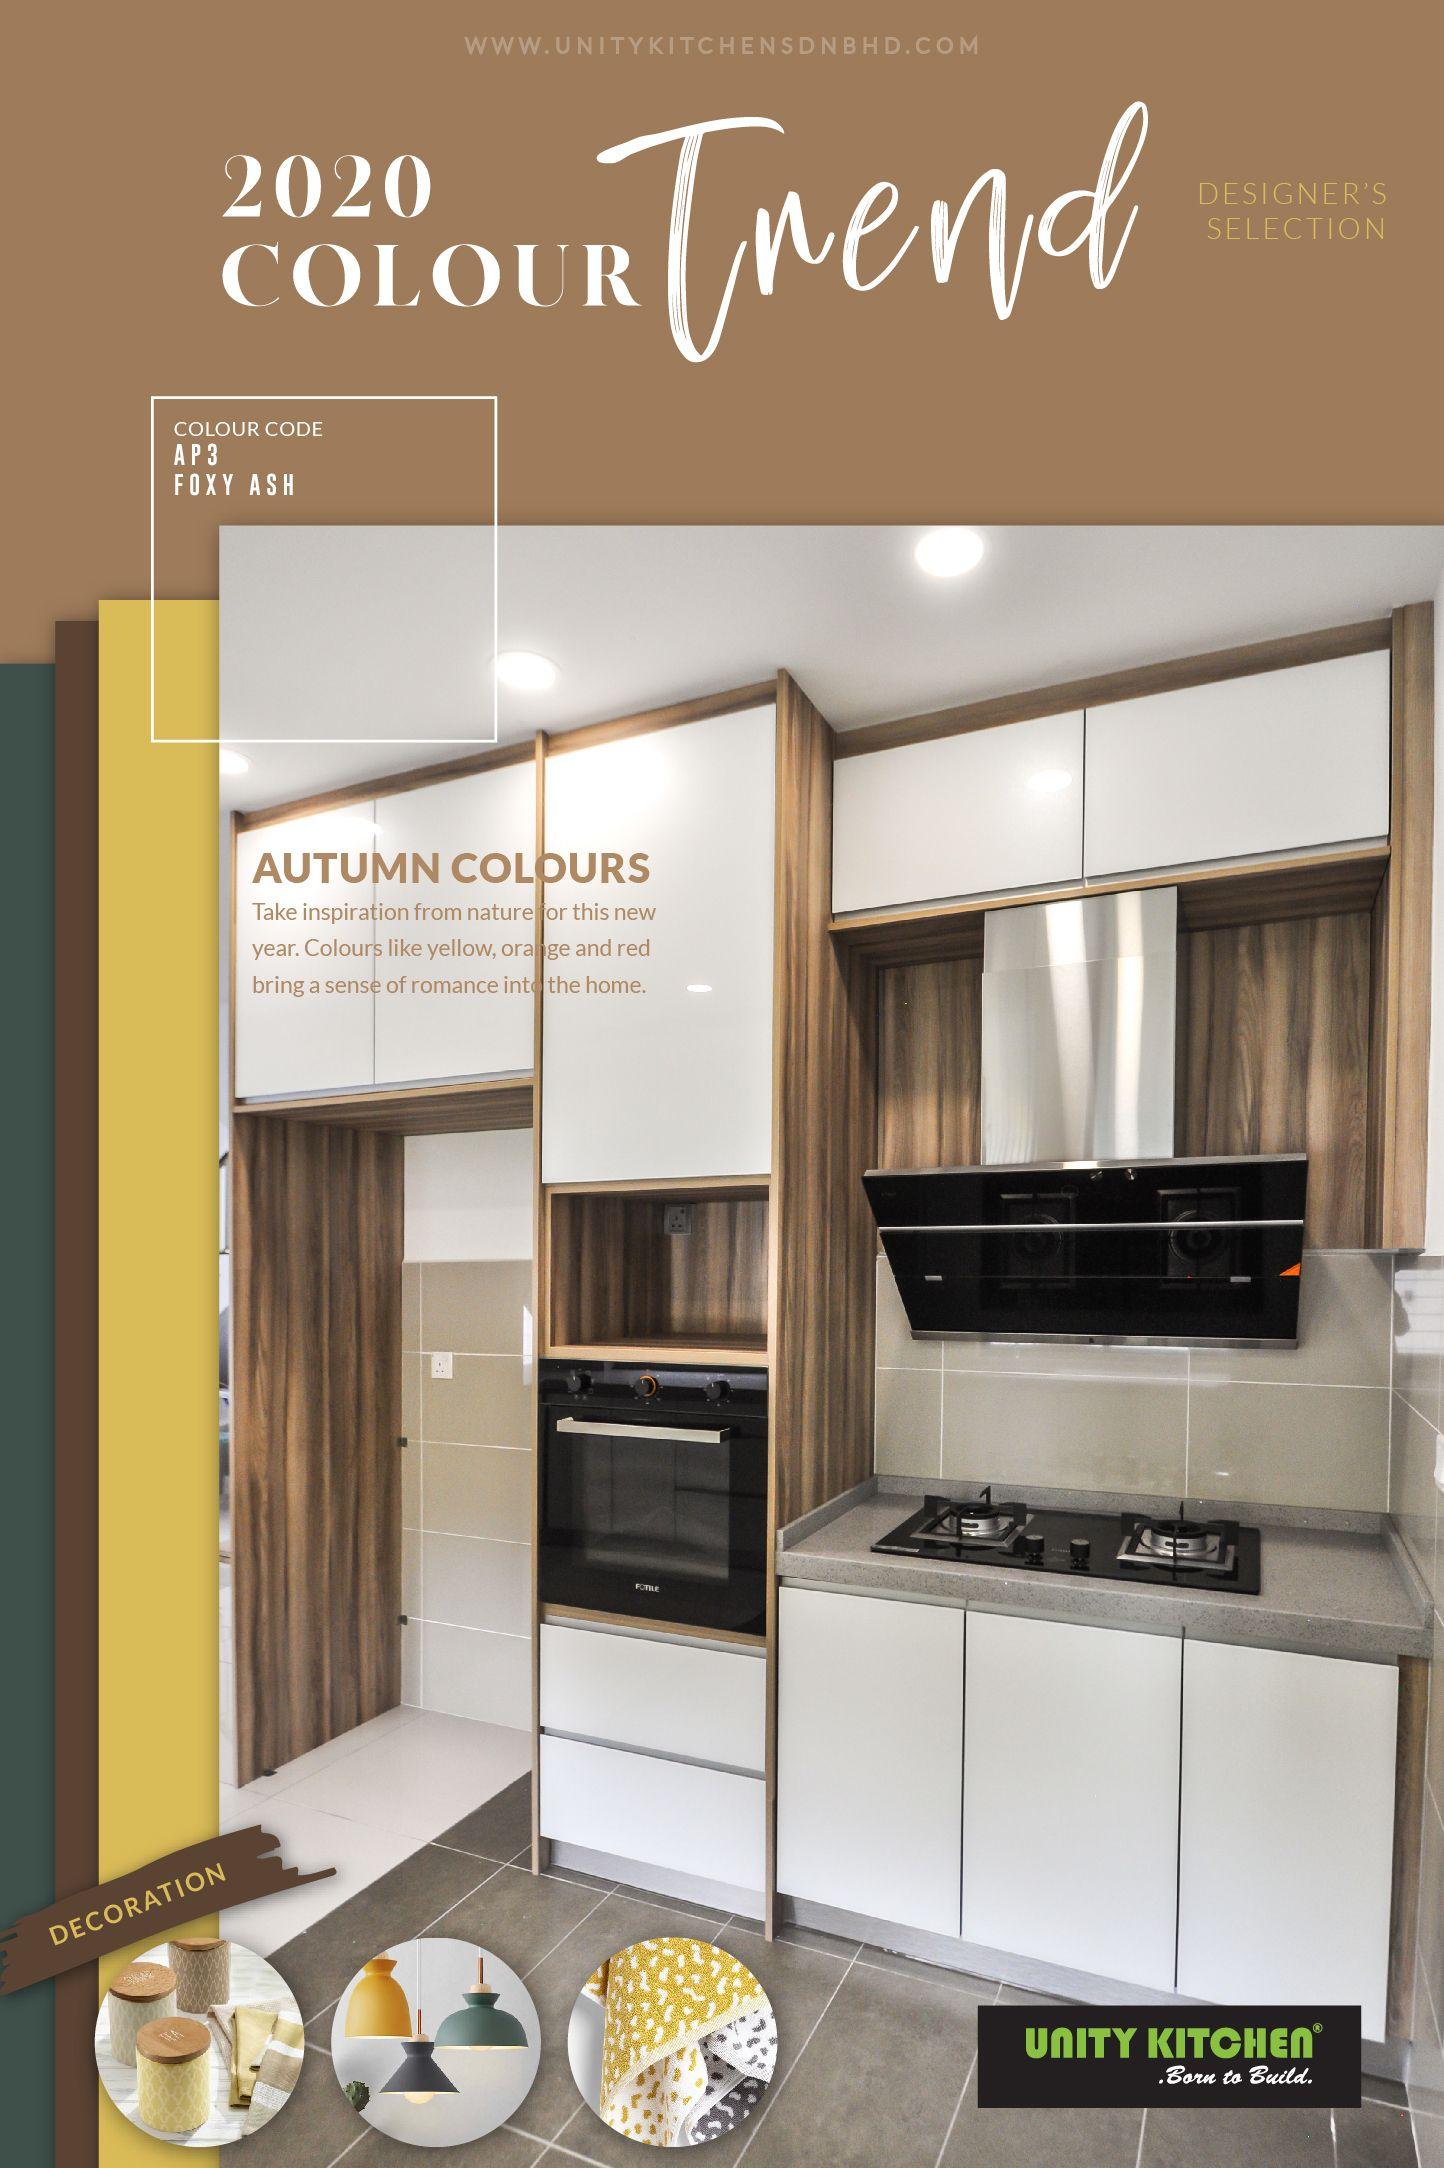 2020 Colour Trend In Interior Design Create Your Own Unique